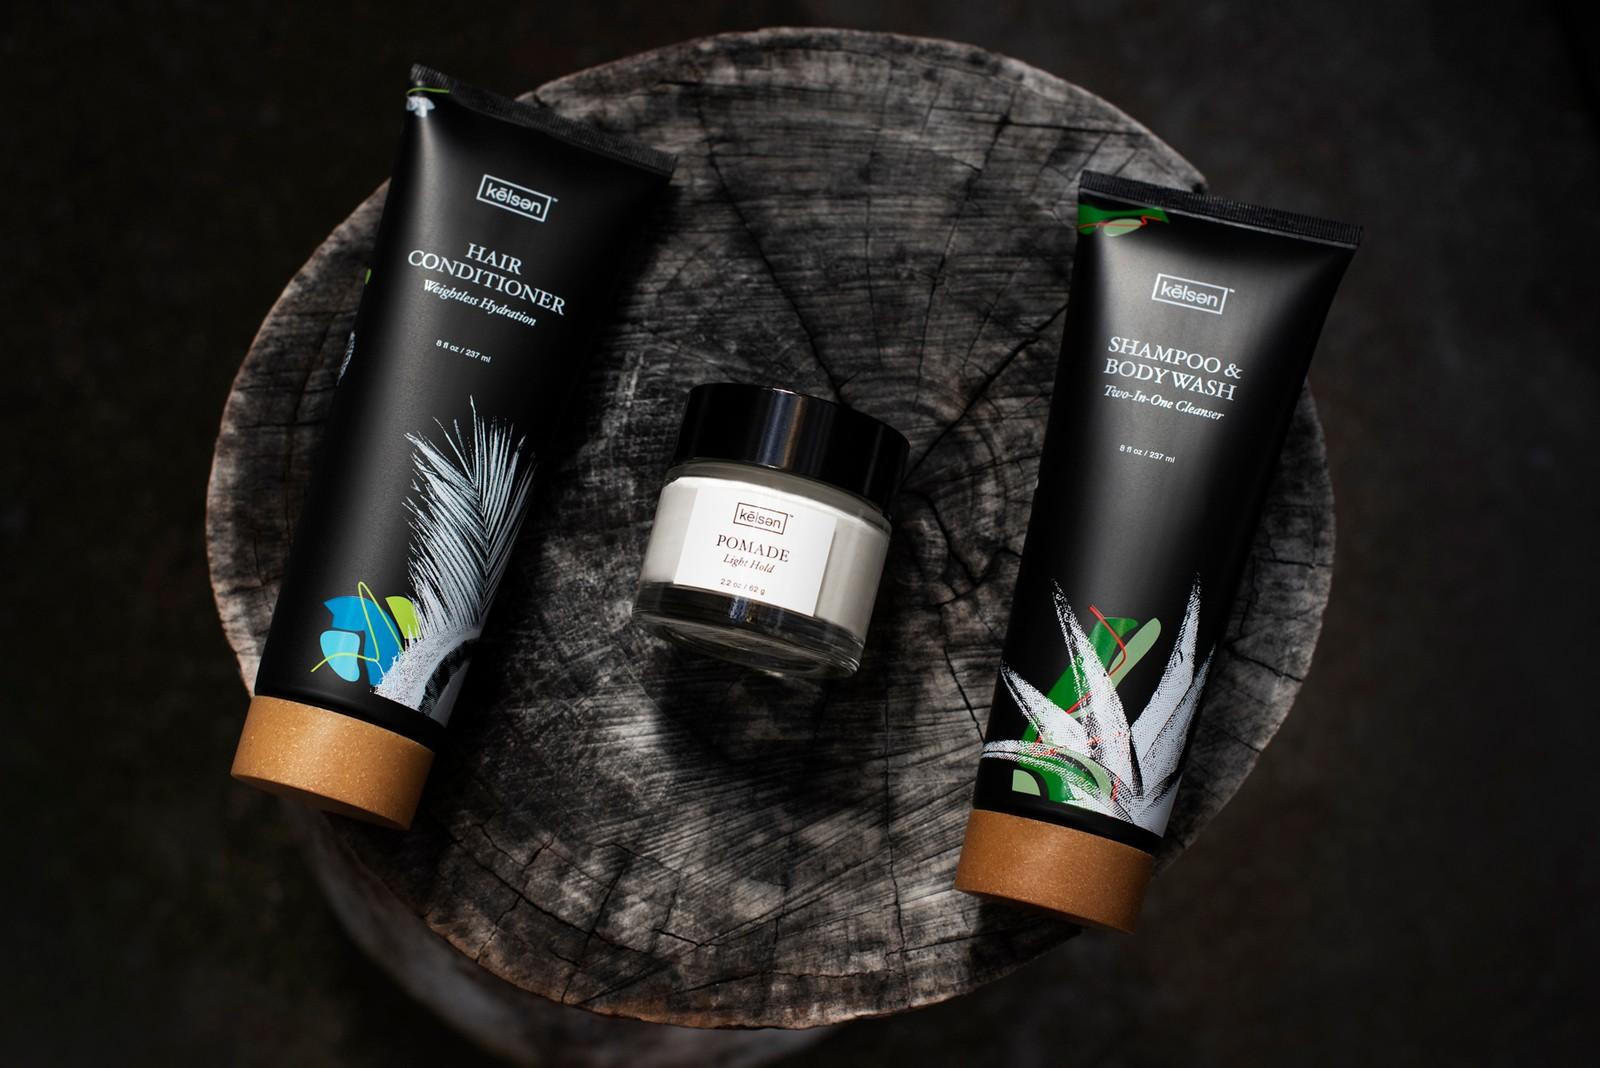 Produse cosmetice sustenabile